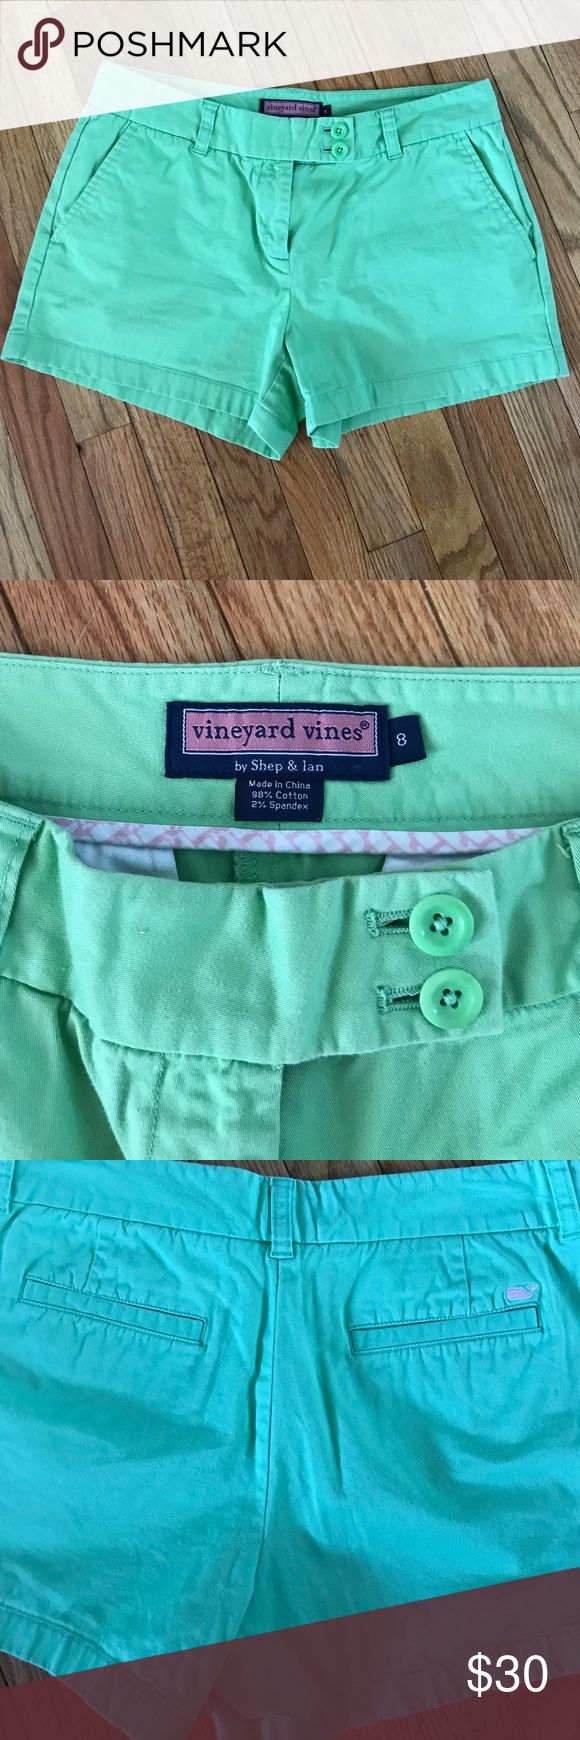 Vineyard vines shorts NWOT.  Lime green shorts.  3.5 inch. Vineyard Vines Shorts